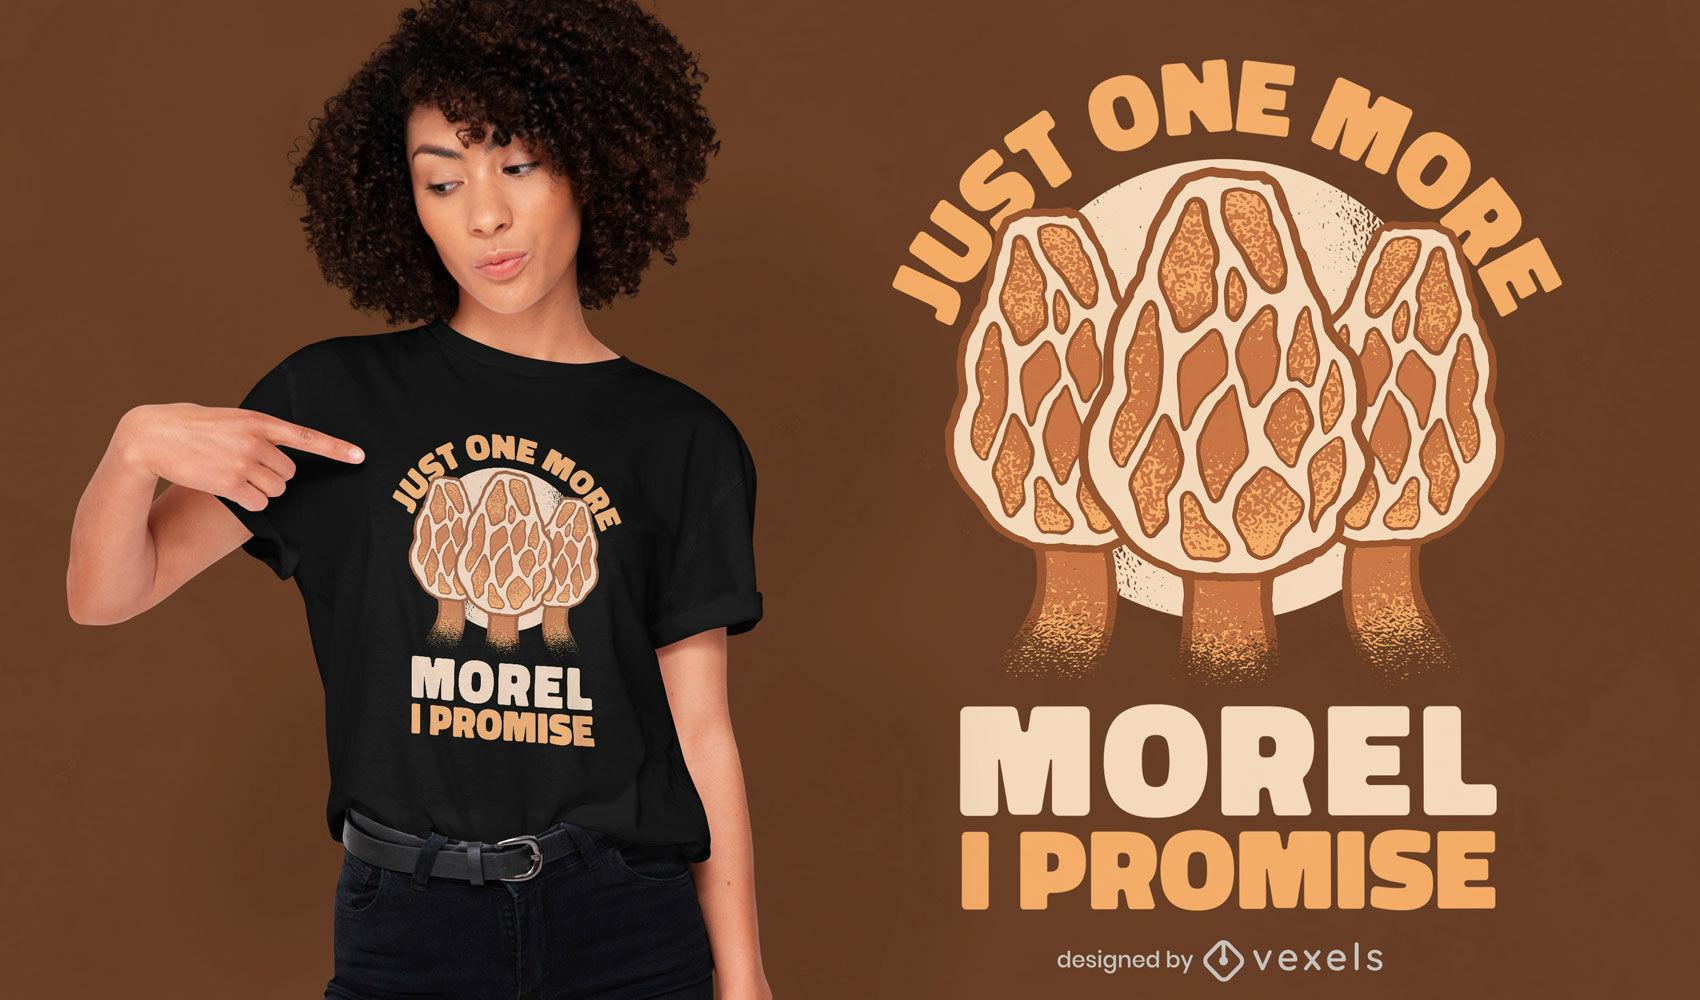 Diseño de camiseta con cita de hongos morel